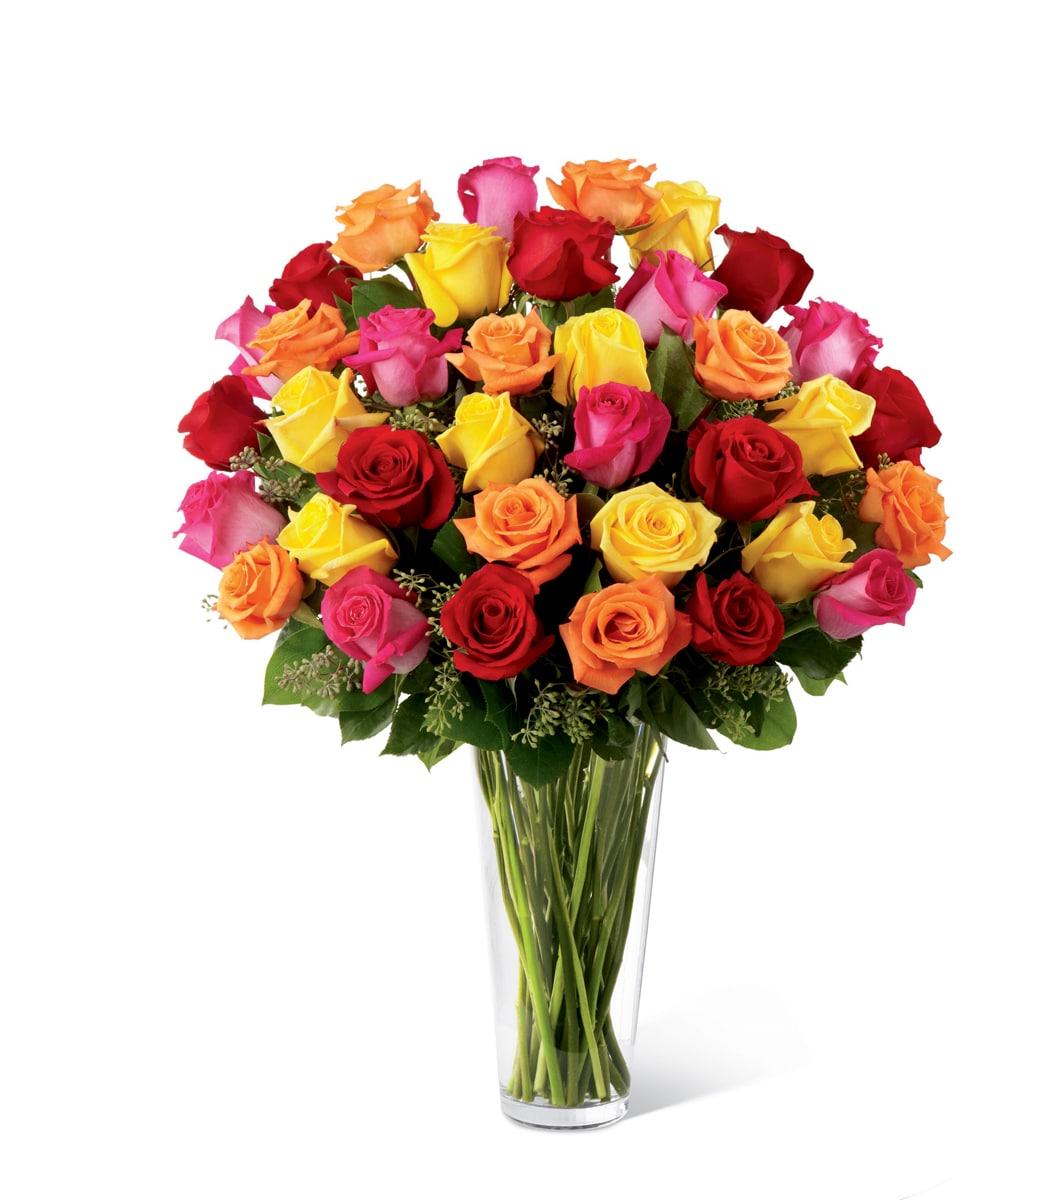 The FTD® Bright Spark™ Bouquet Exquisite